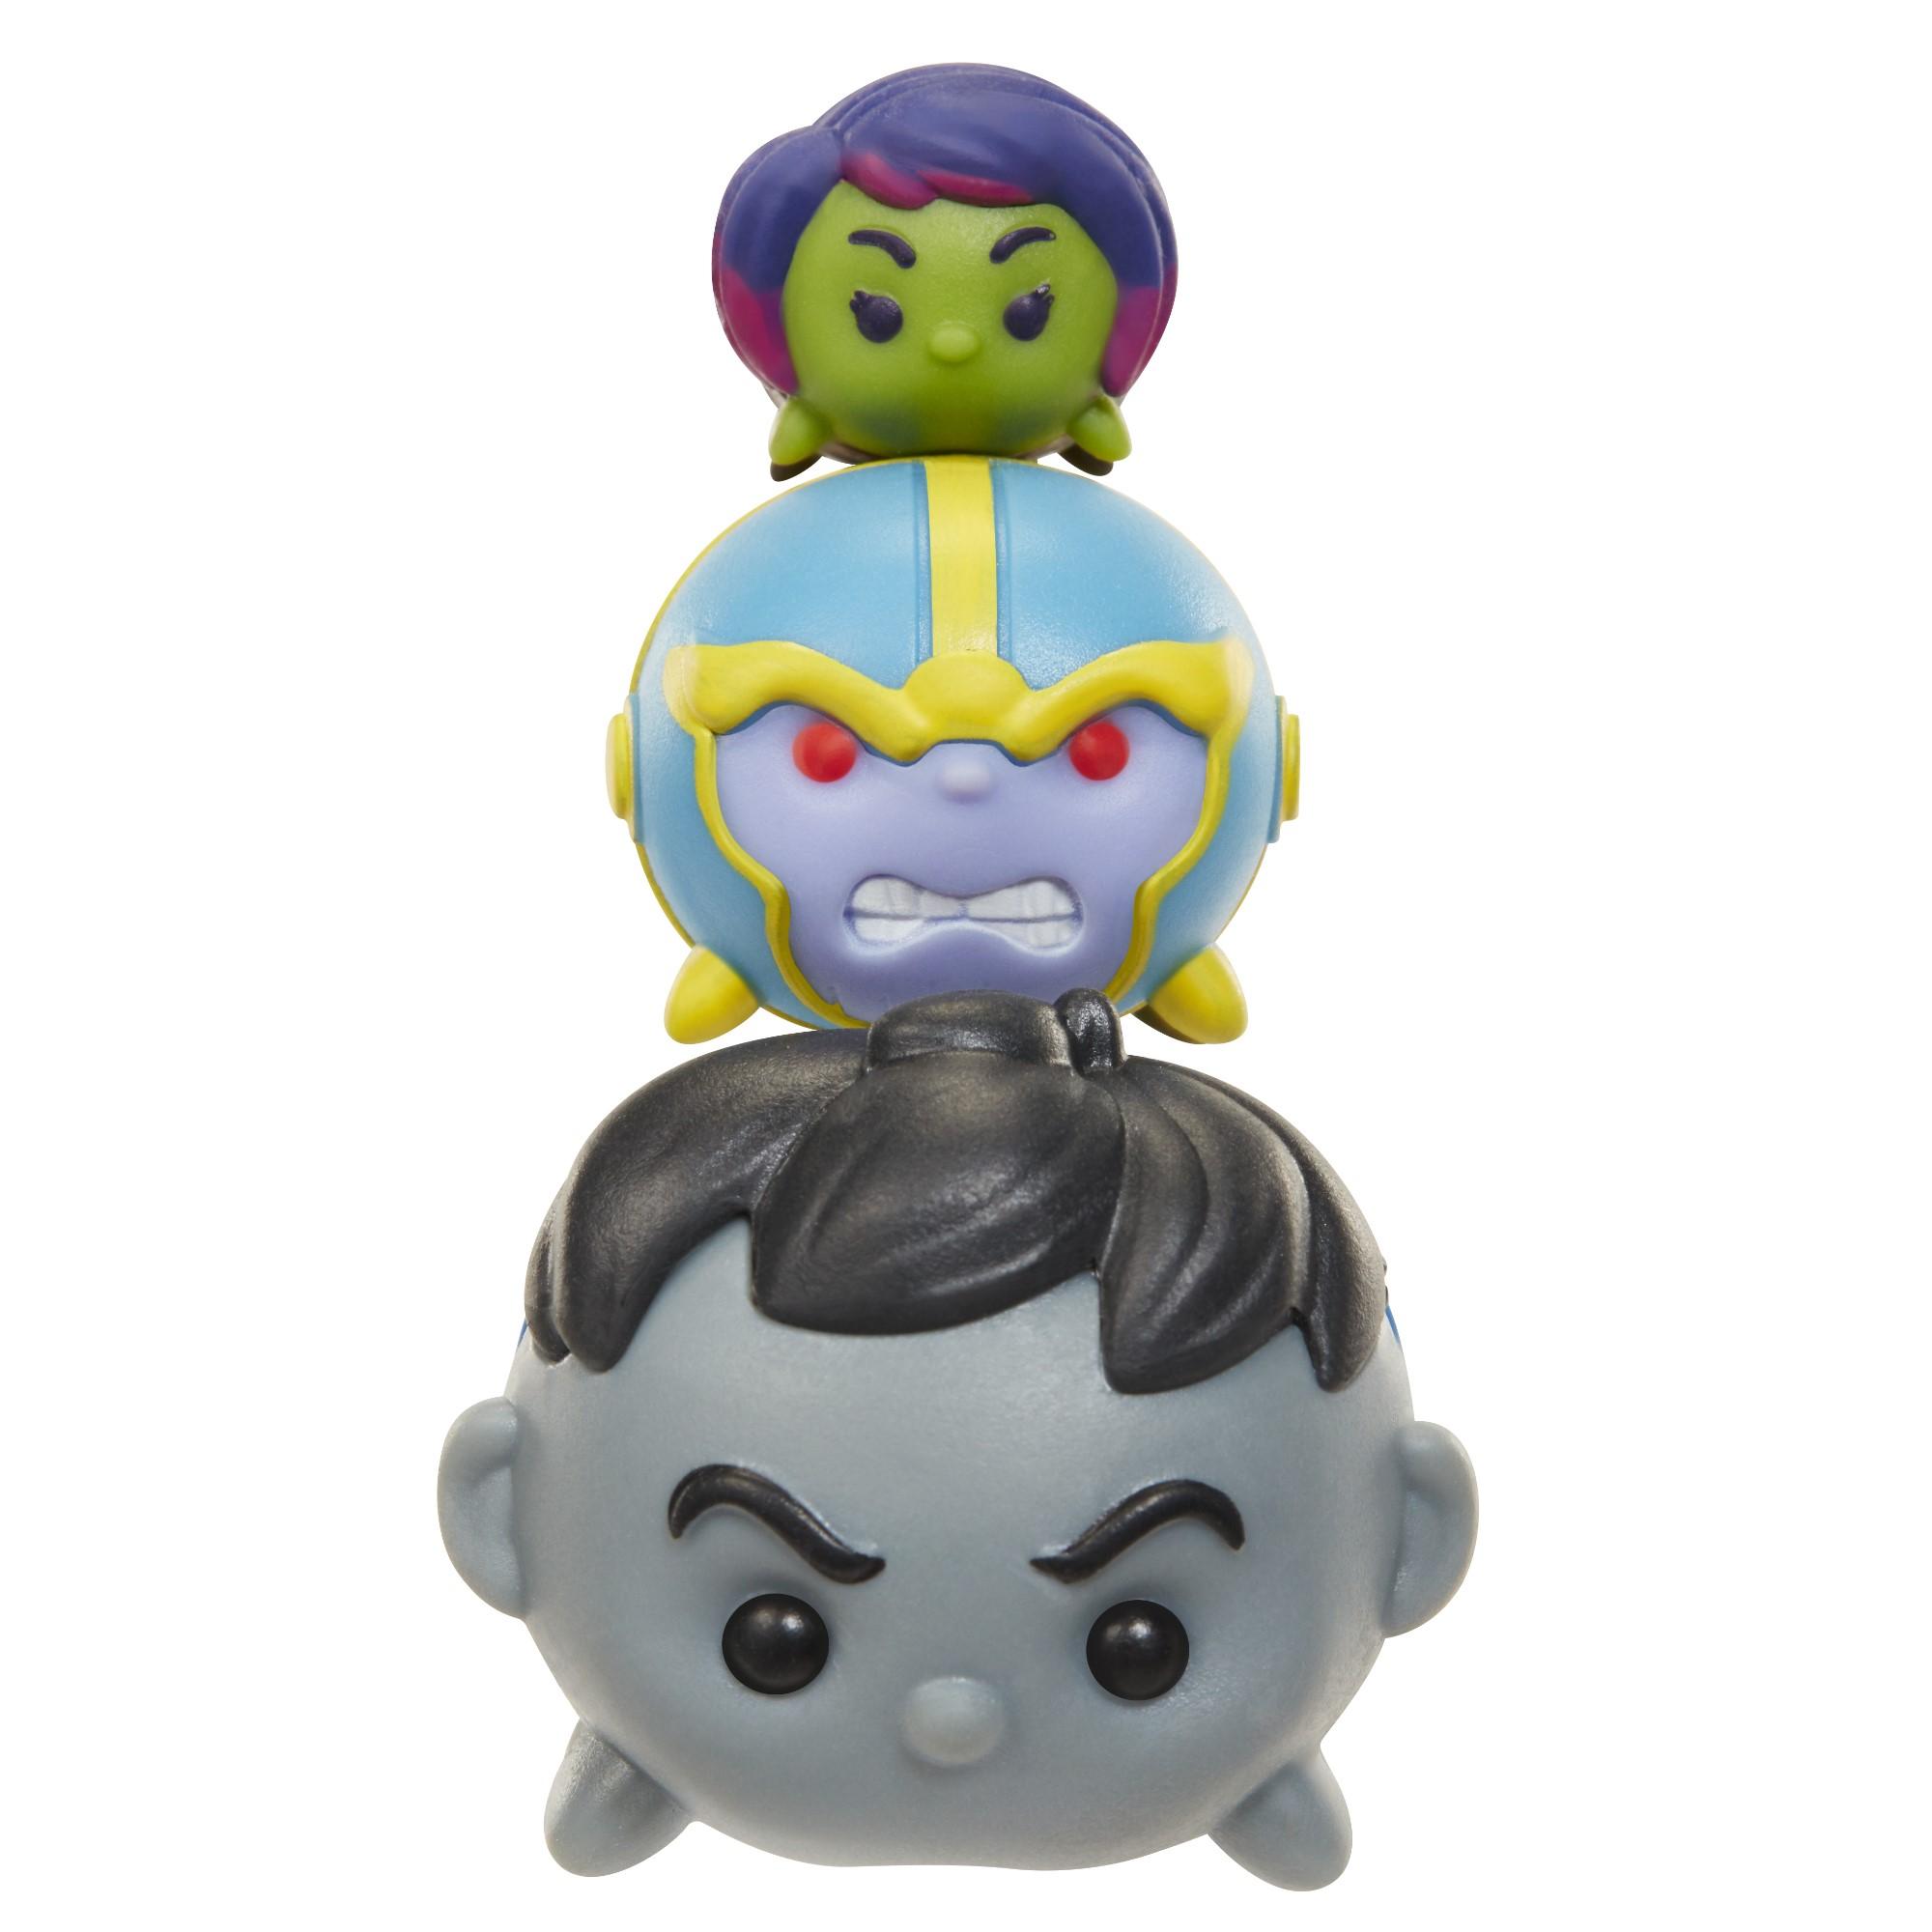 Marvel Tsum Tsum 3-Pack Figures - Hulk (Grey)/Thanos/Gamora